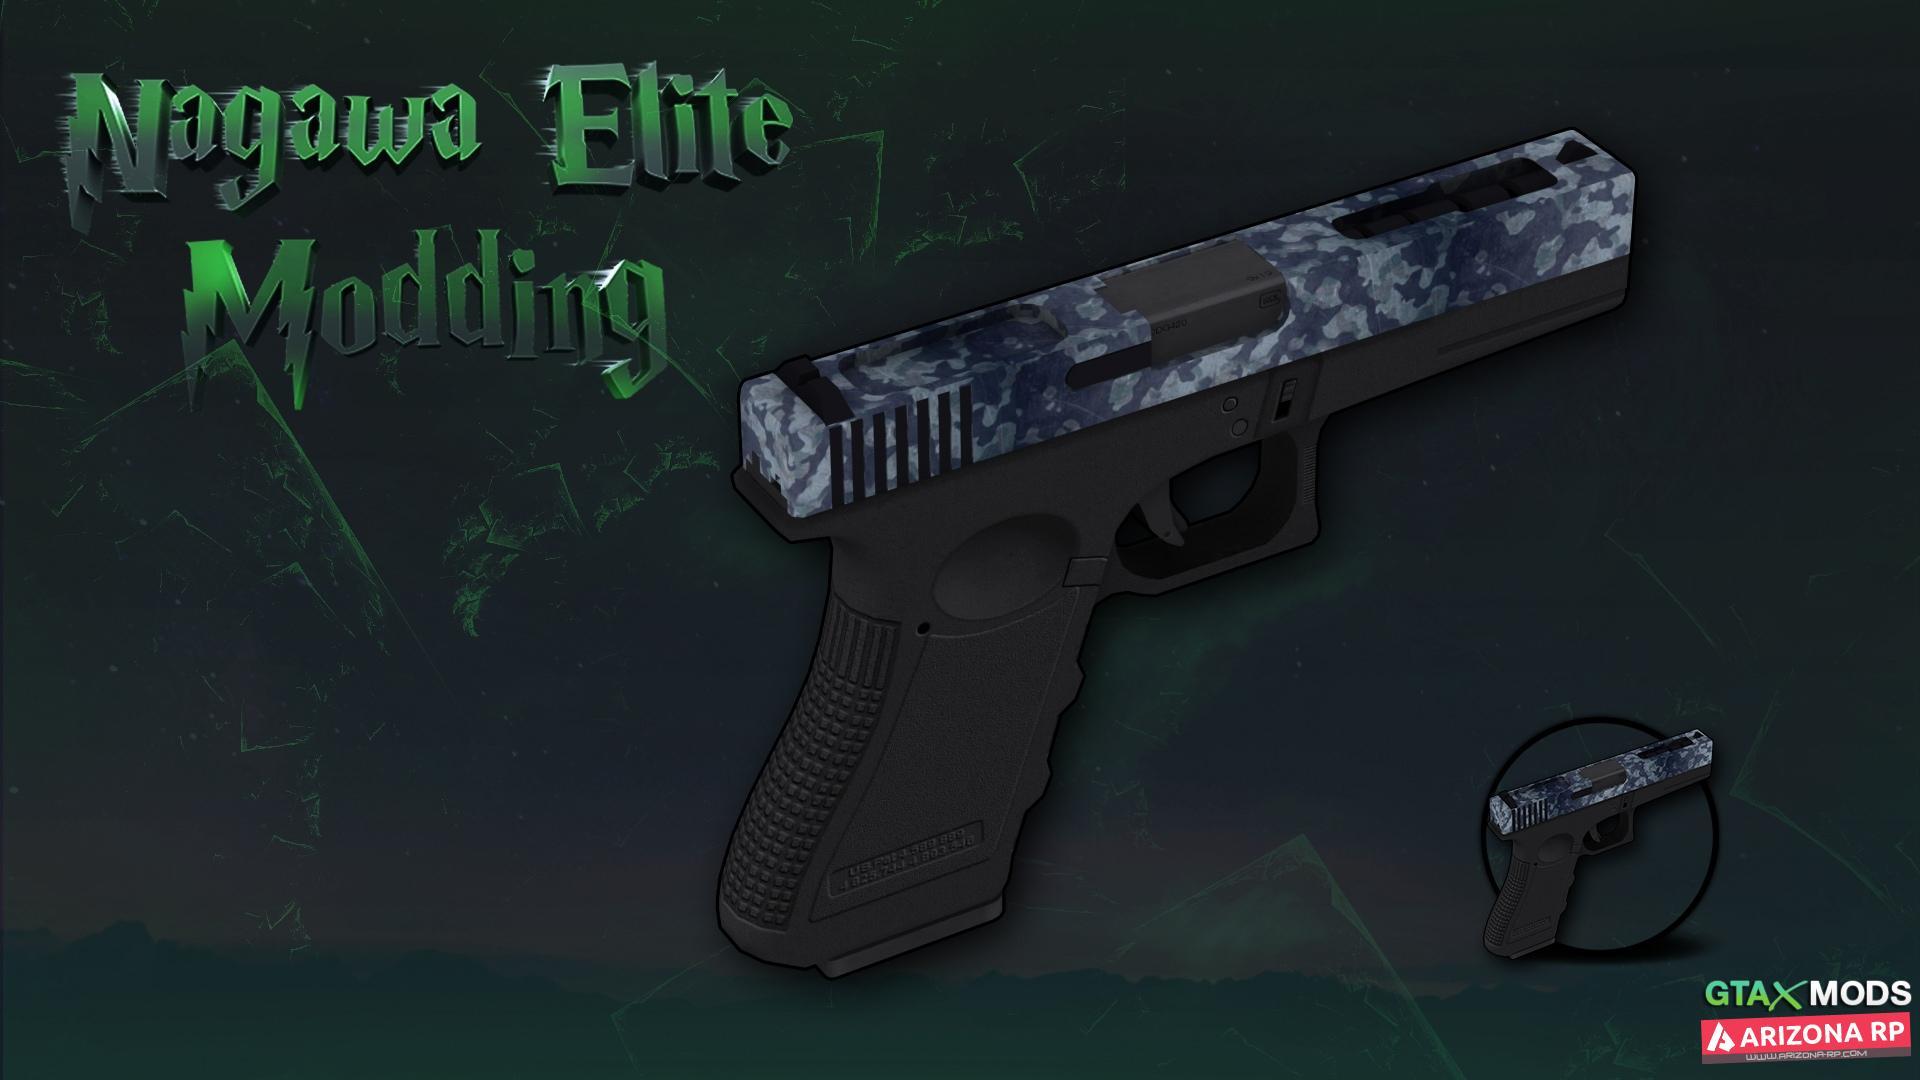 New Deagle Two | Nagawa Elite Modding